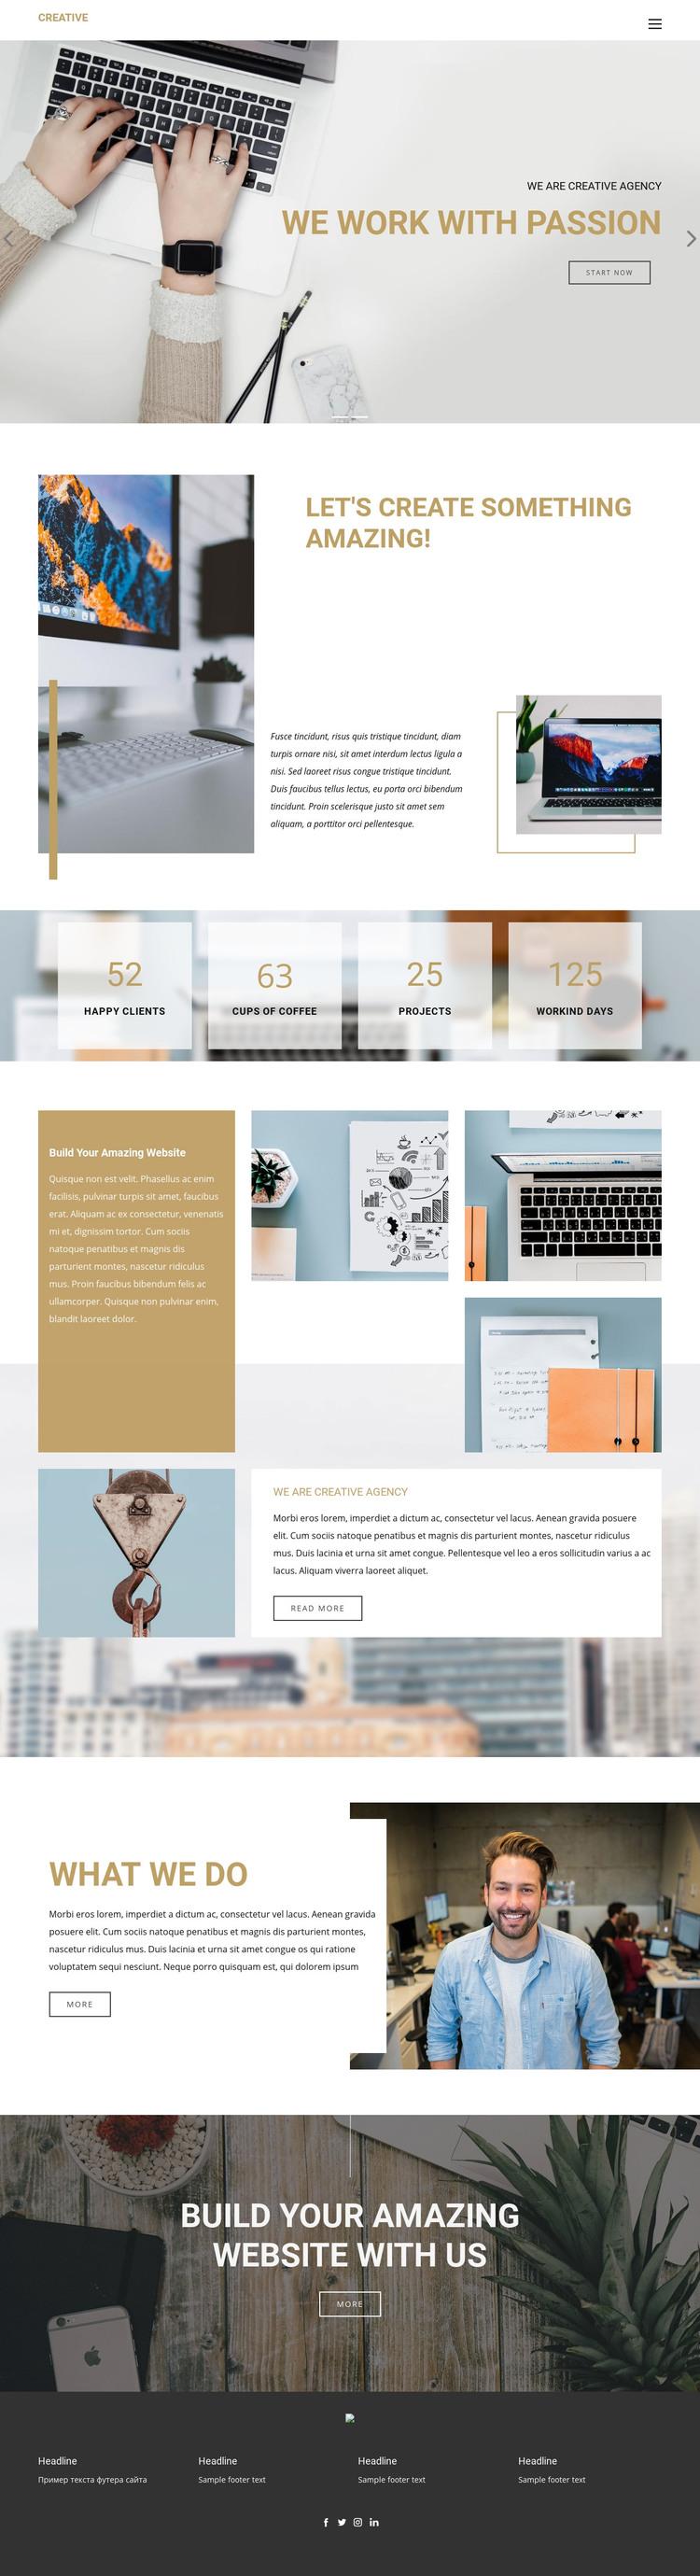 Exceptional creative designs Homepage Design